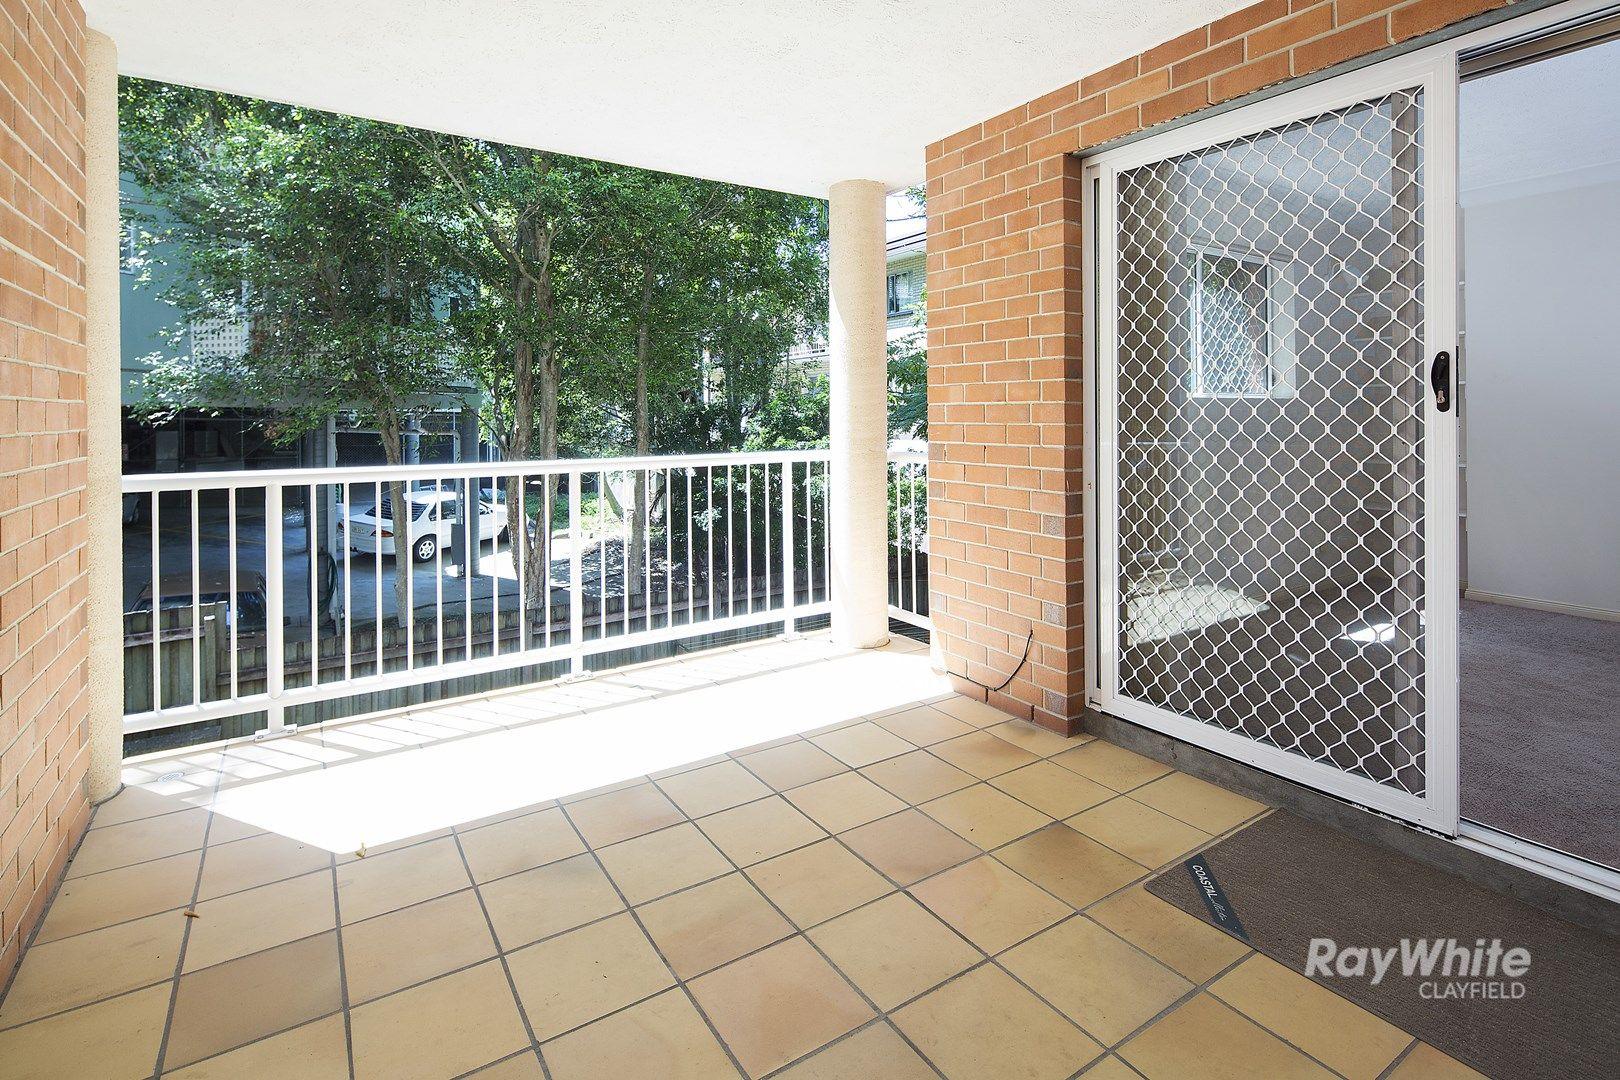 3/89 Riverton Street, Clayfield QLD 4011, Image 0